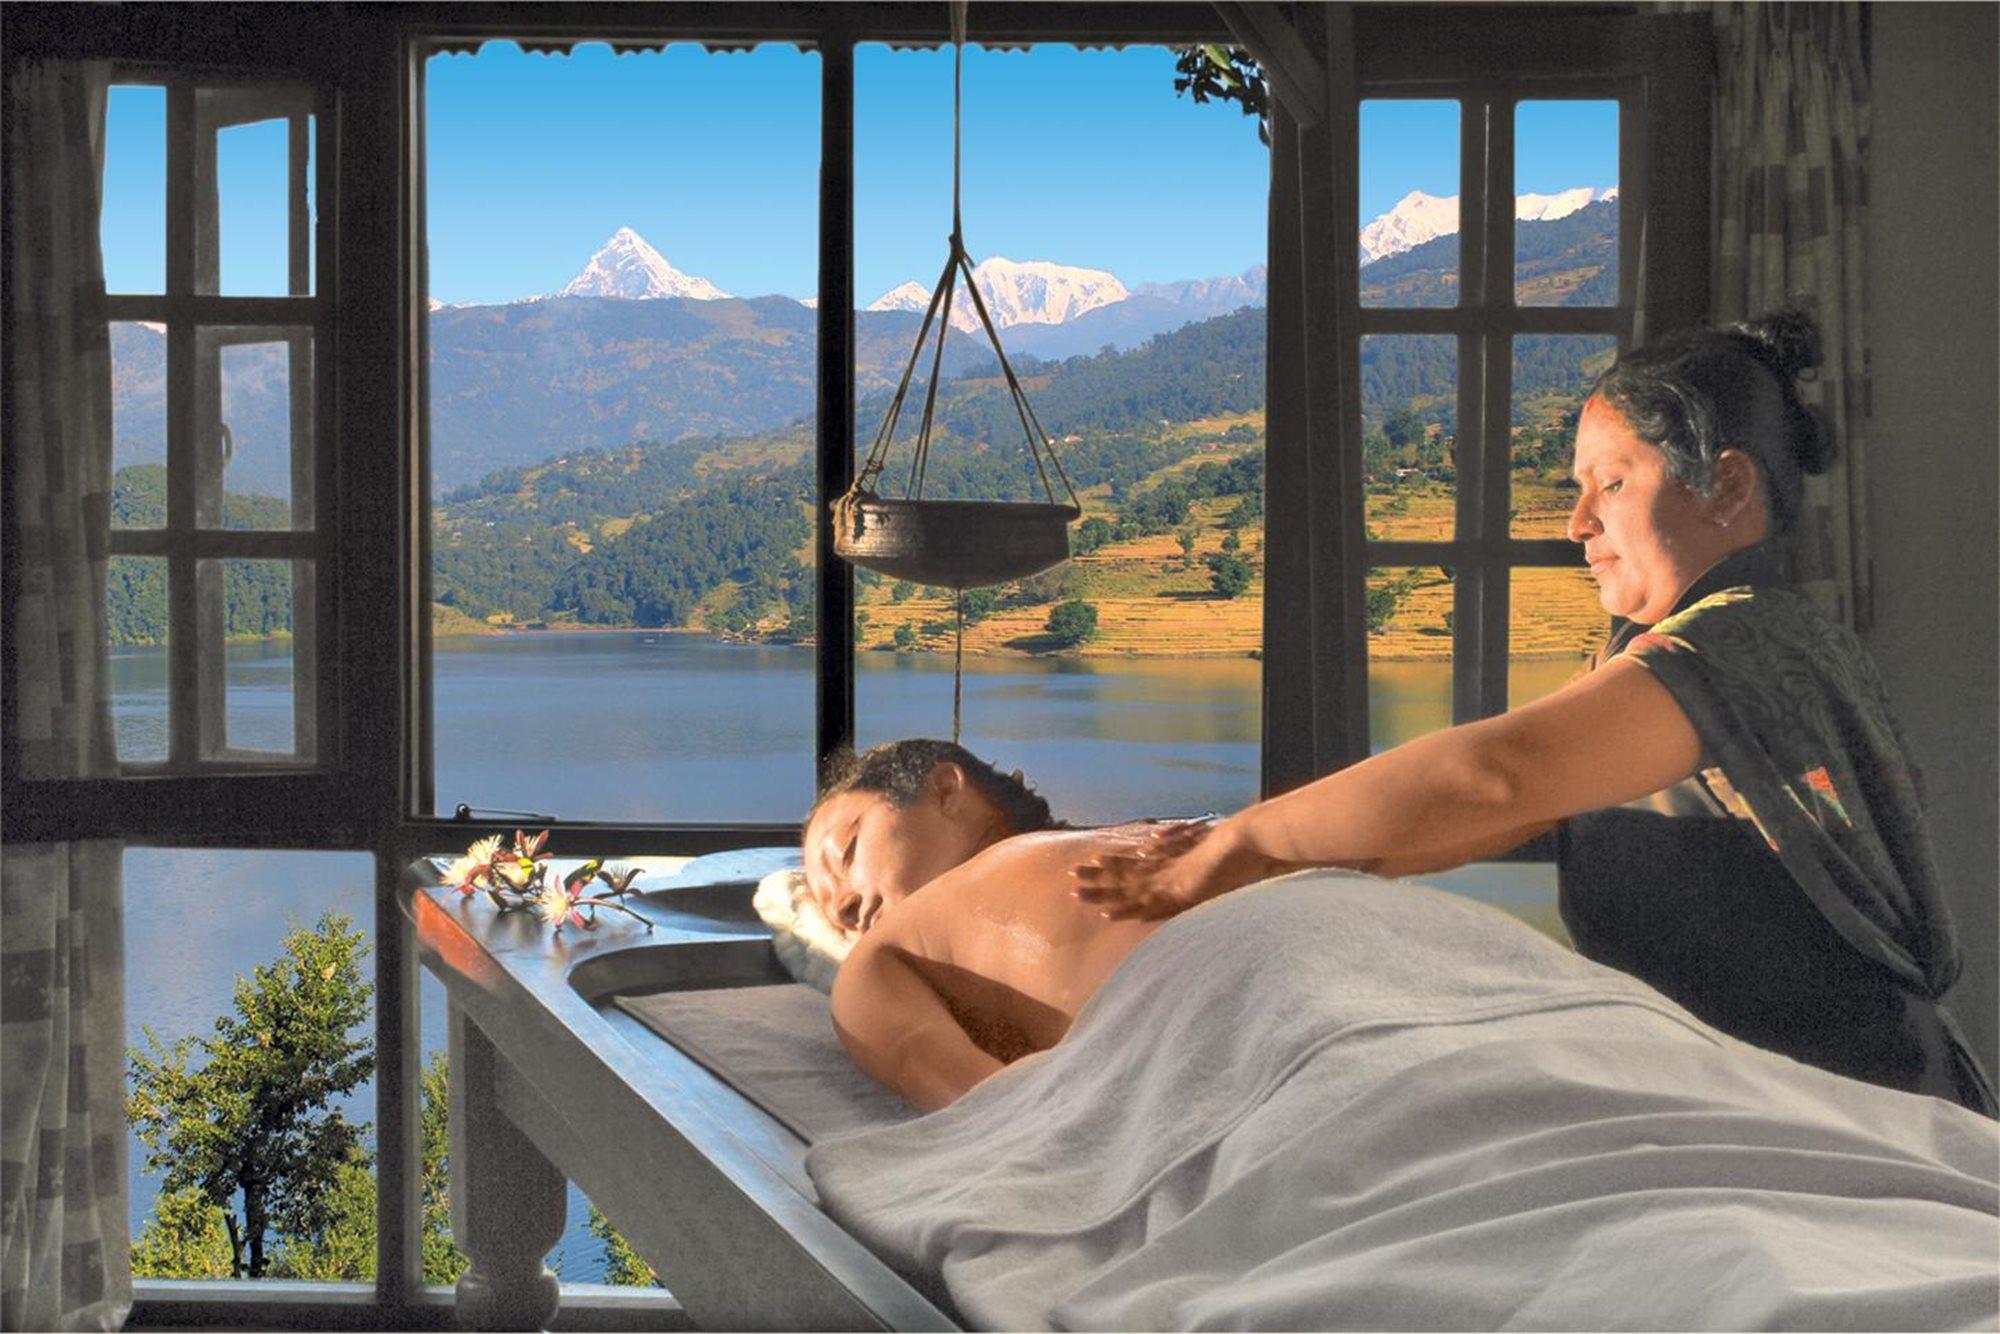 ayurveda and yoga retreat nepal spadreams